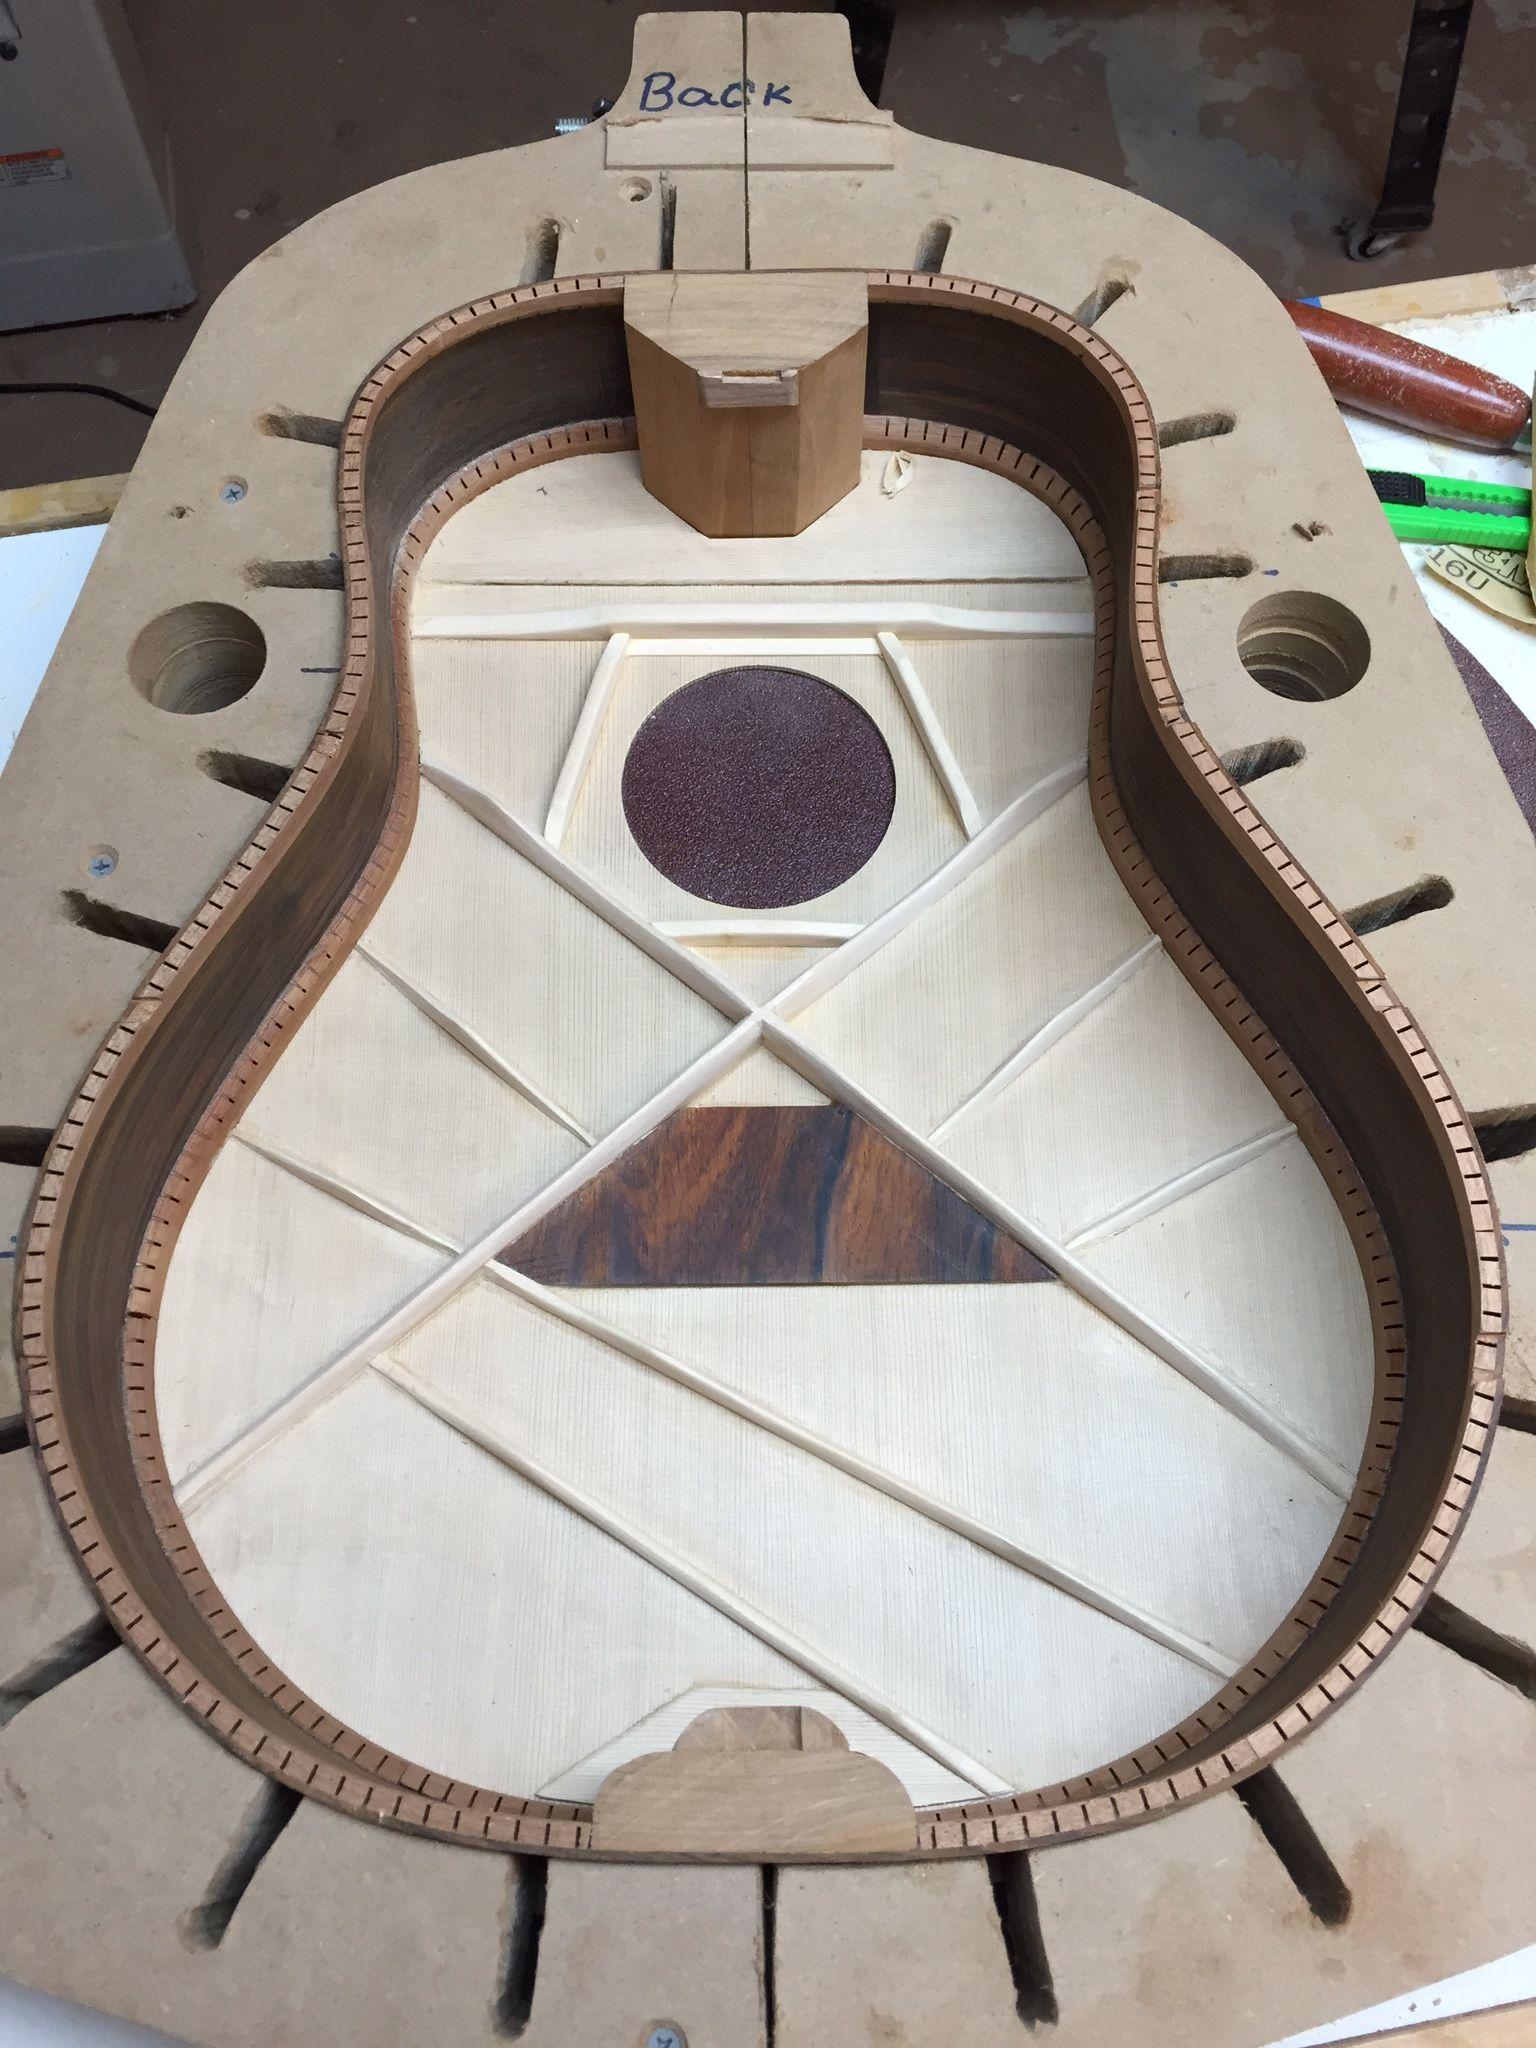 pin by jerseybear on luthier in 2019 guitar diy guitar shop cigar box guitar. Black Bedroom Furniture Sets. Home Design Ideas